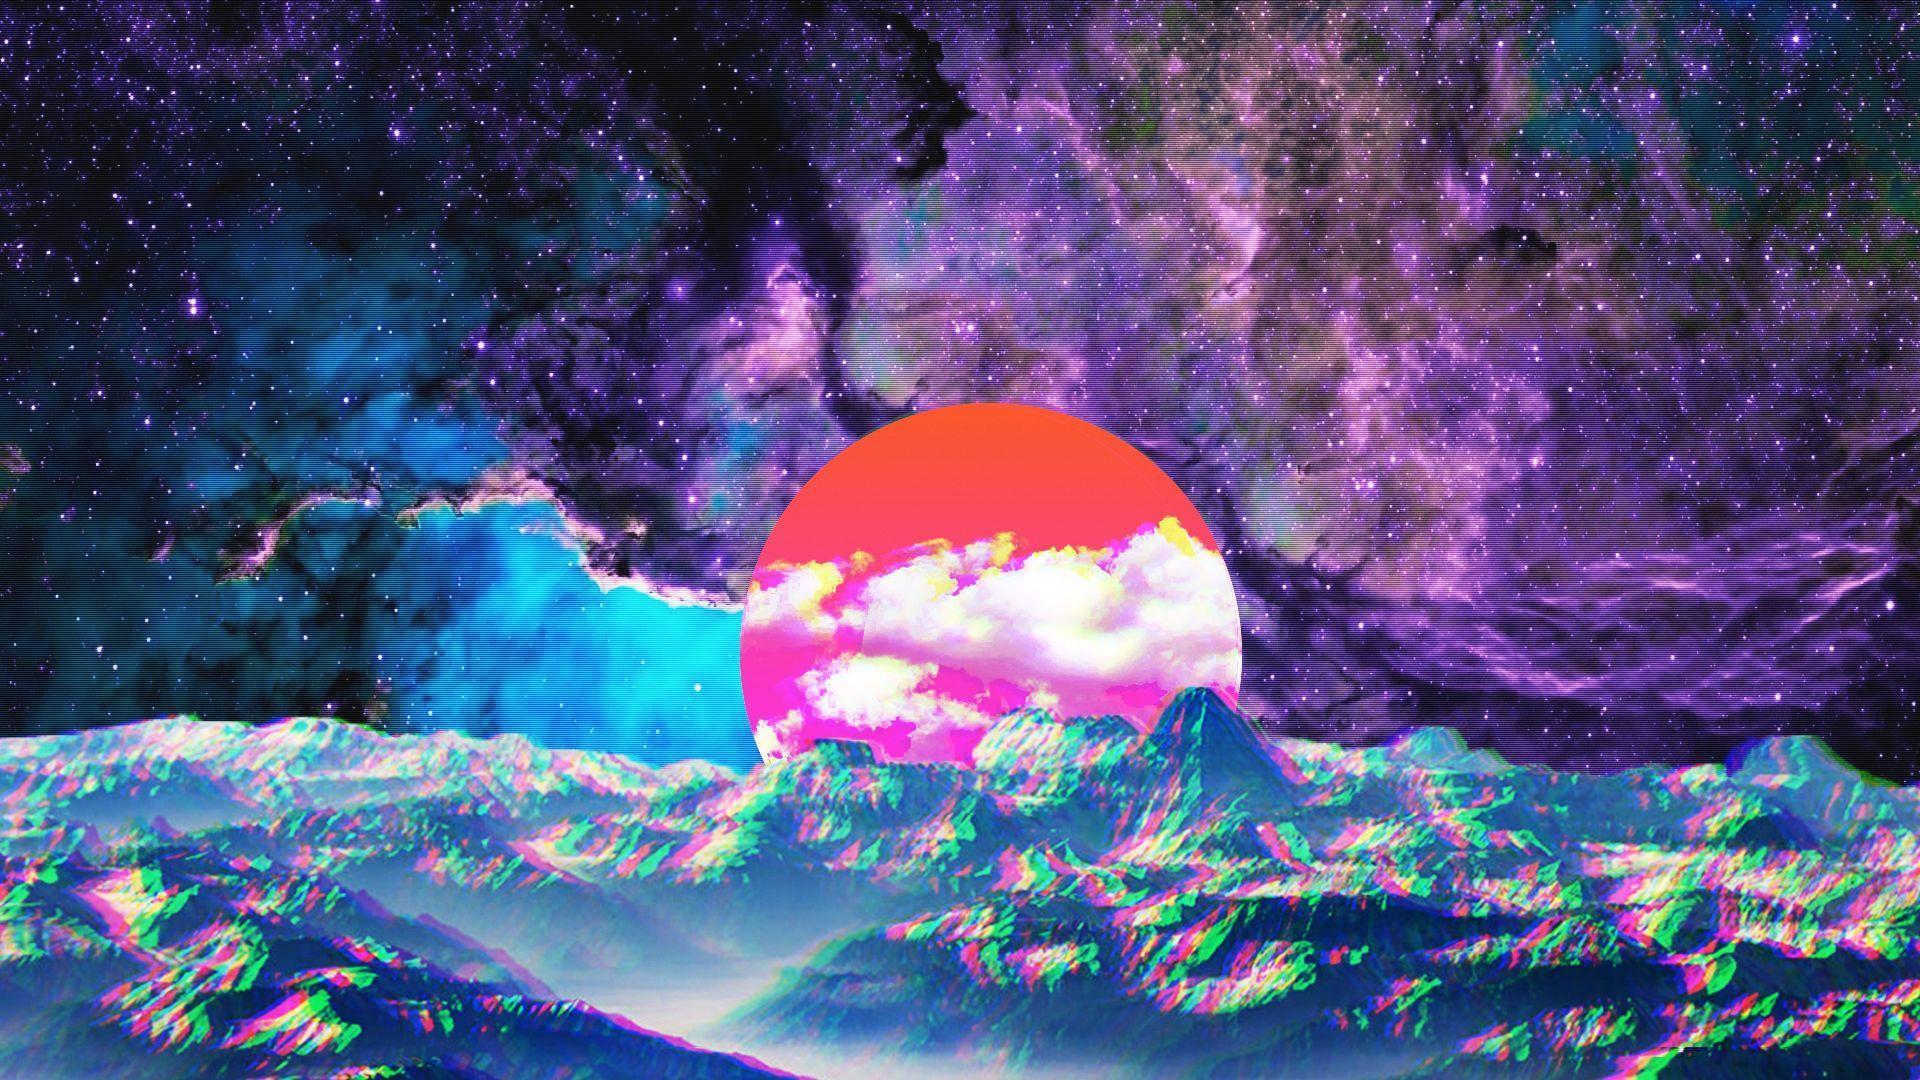 Grunge Aesthetic Mac Wallpapers Top Free Grunge Aesthetic Mac